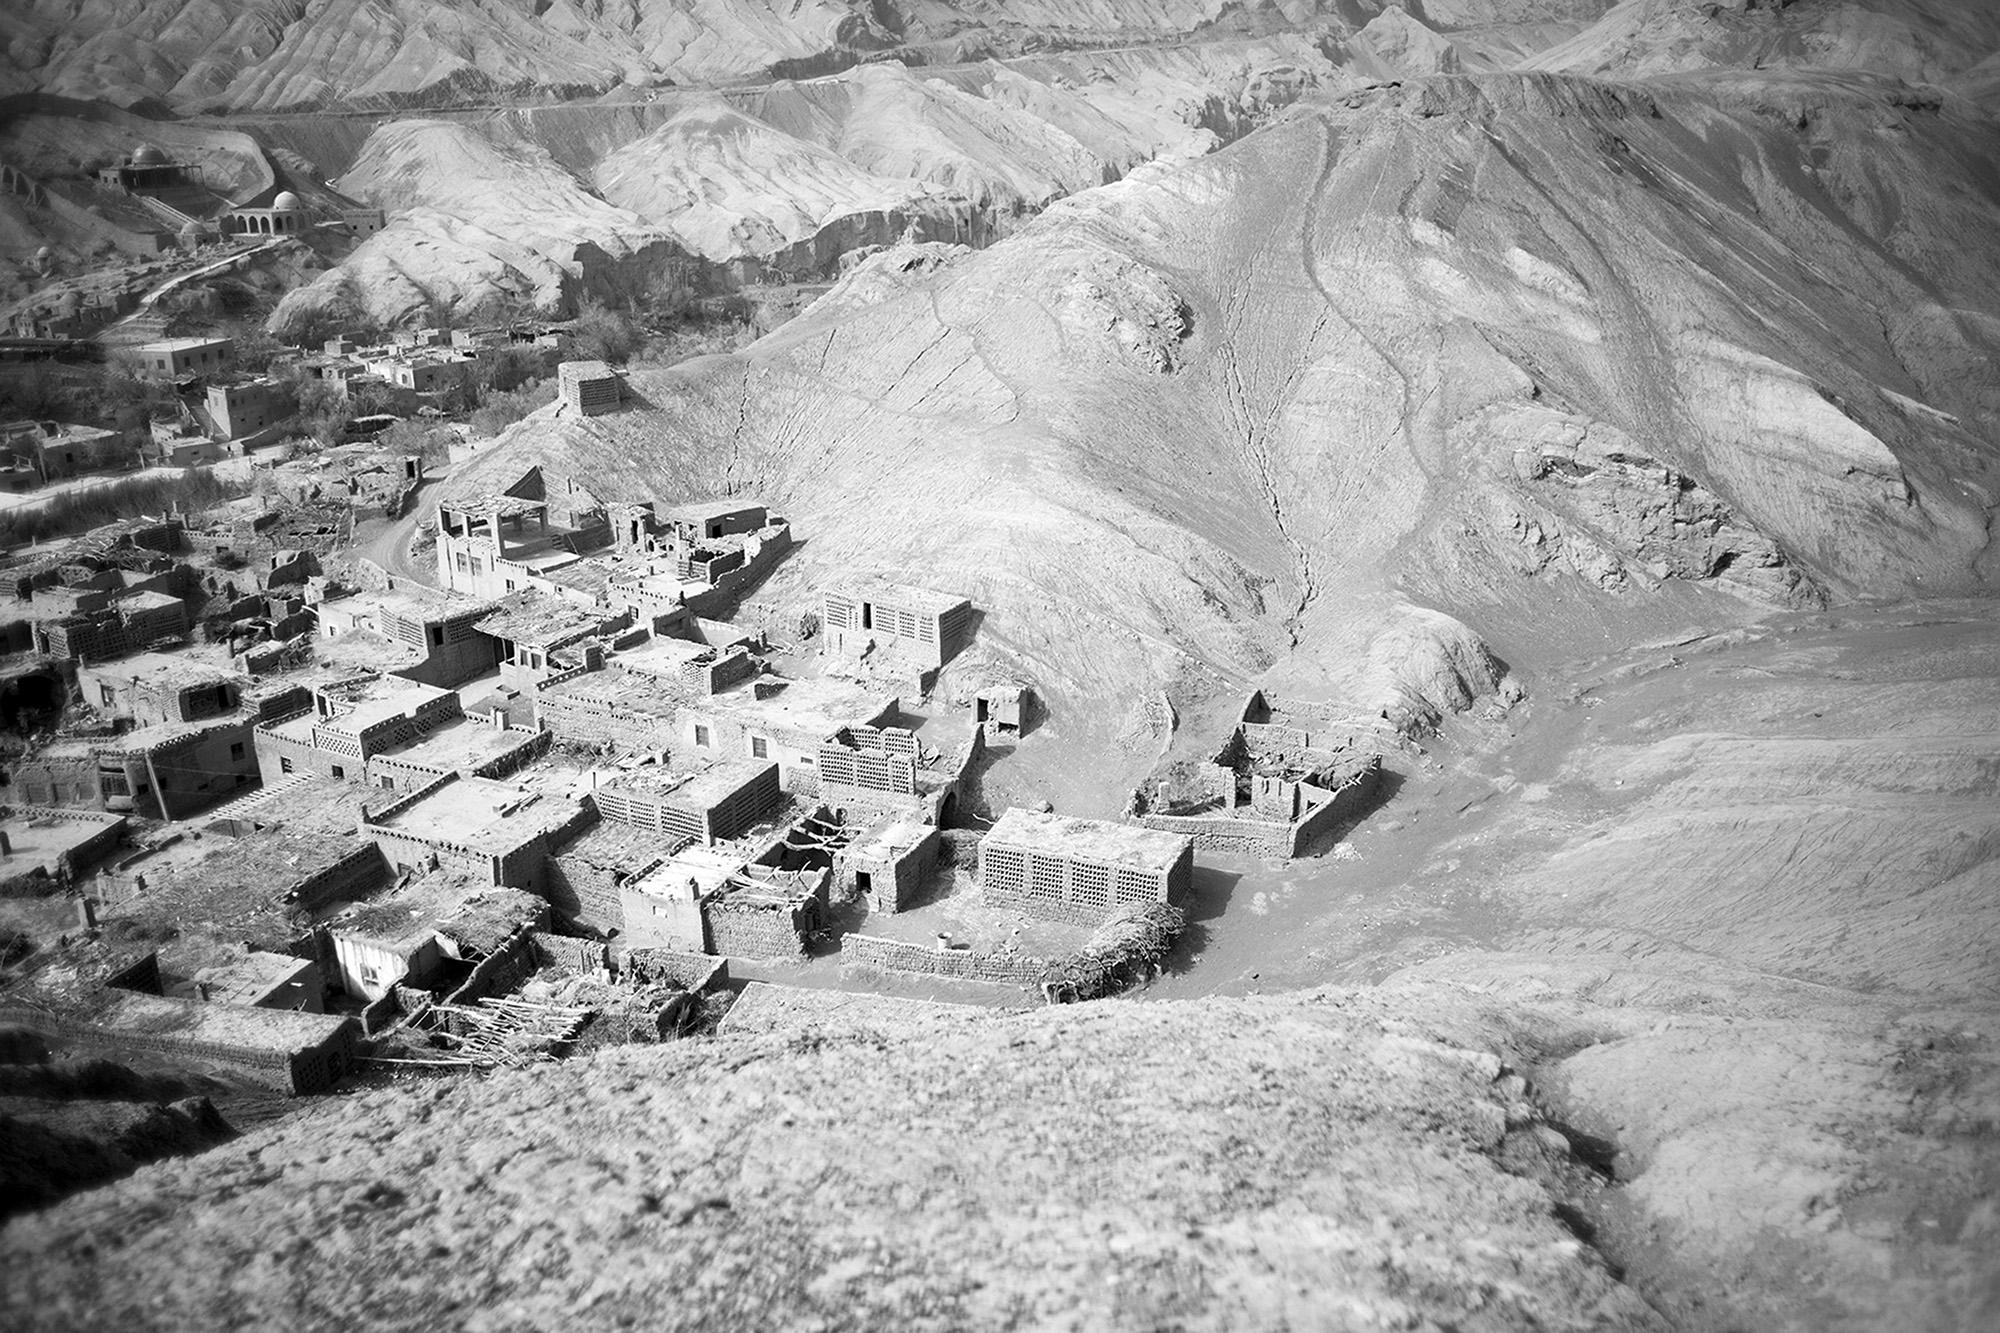 Xinjiang Région ouïghoure Maxime Crozet Identité Chine Tuyok